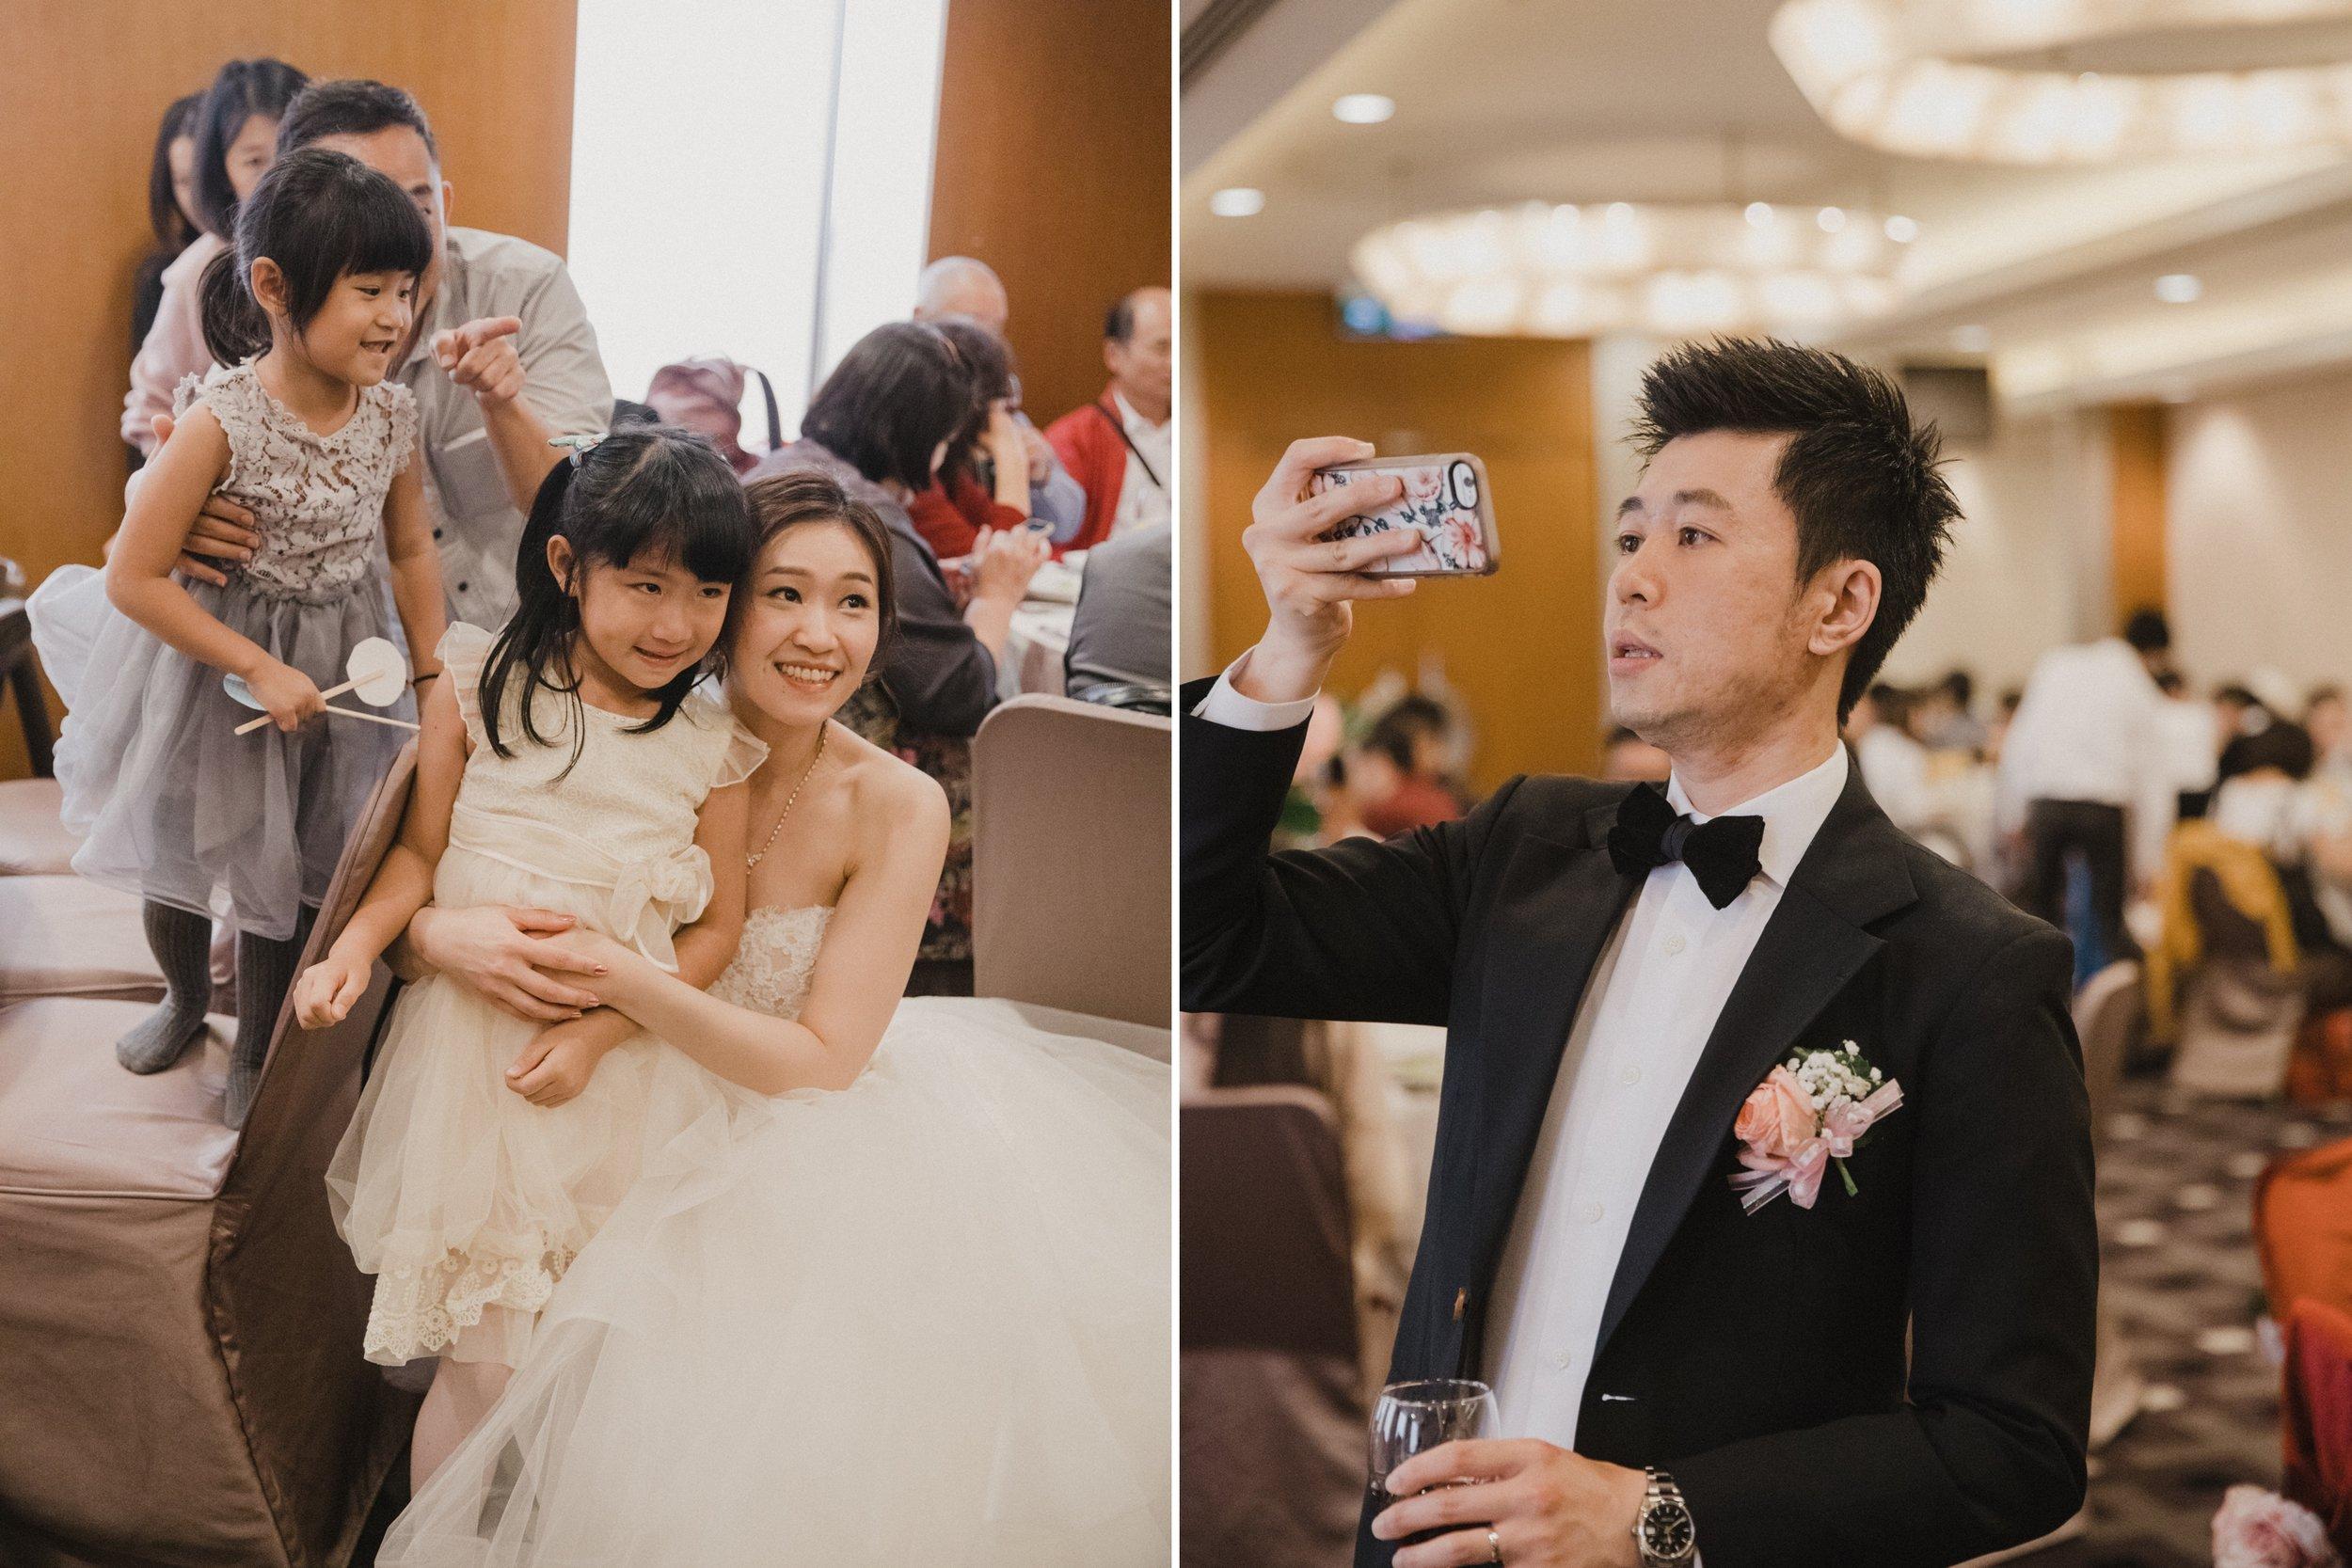 wedding-caridee-oscar-lunch-ambassador-hsinchu-結婚午宴-新竹國賓_135.jpg